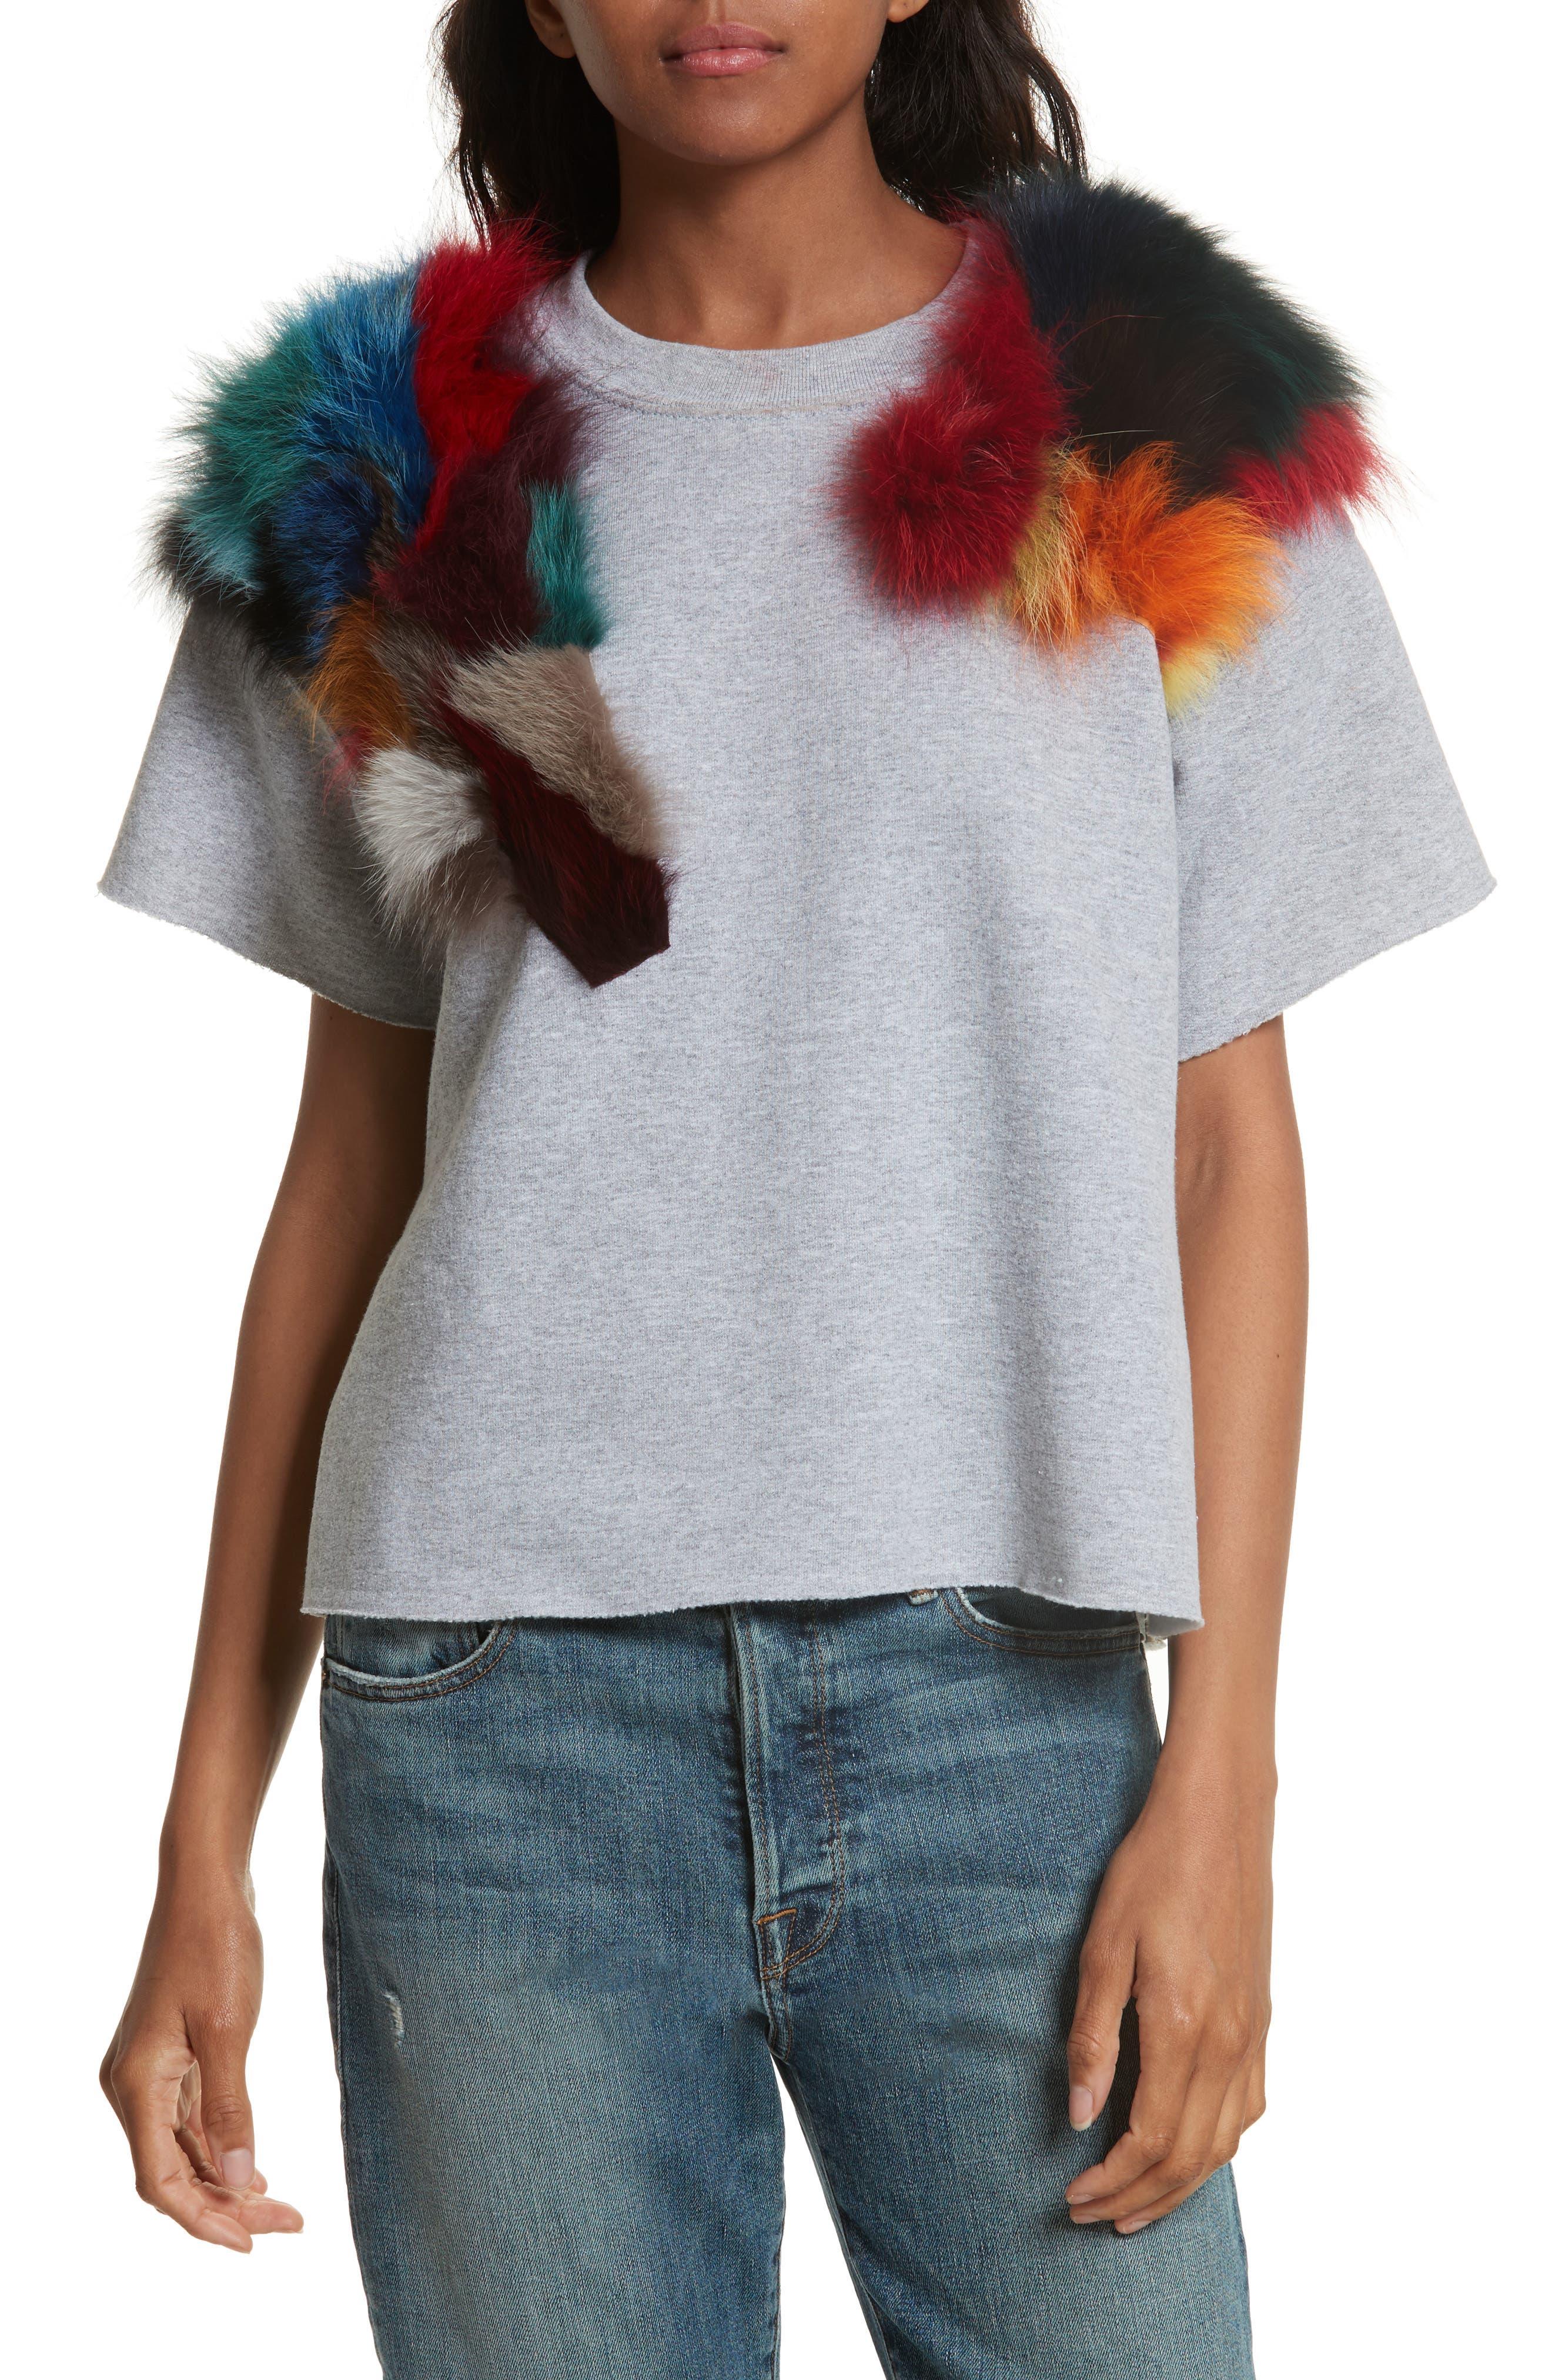 Harvey Faircloth Sweatshirt with Genuine Fox Fur Trim